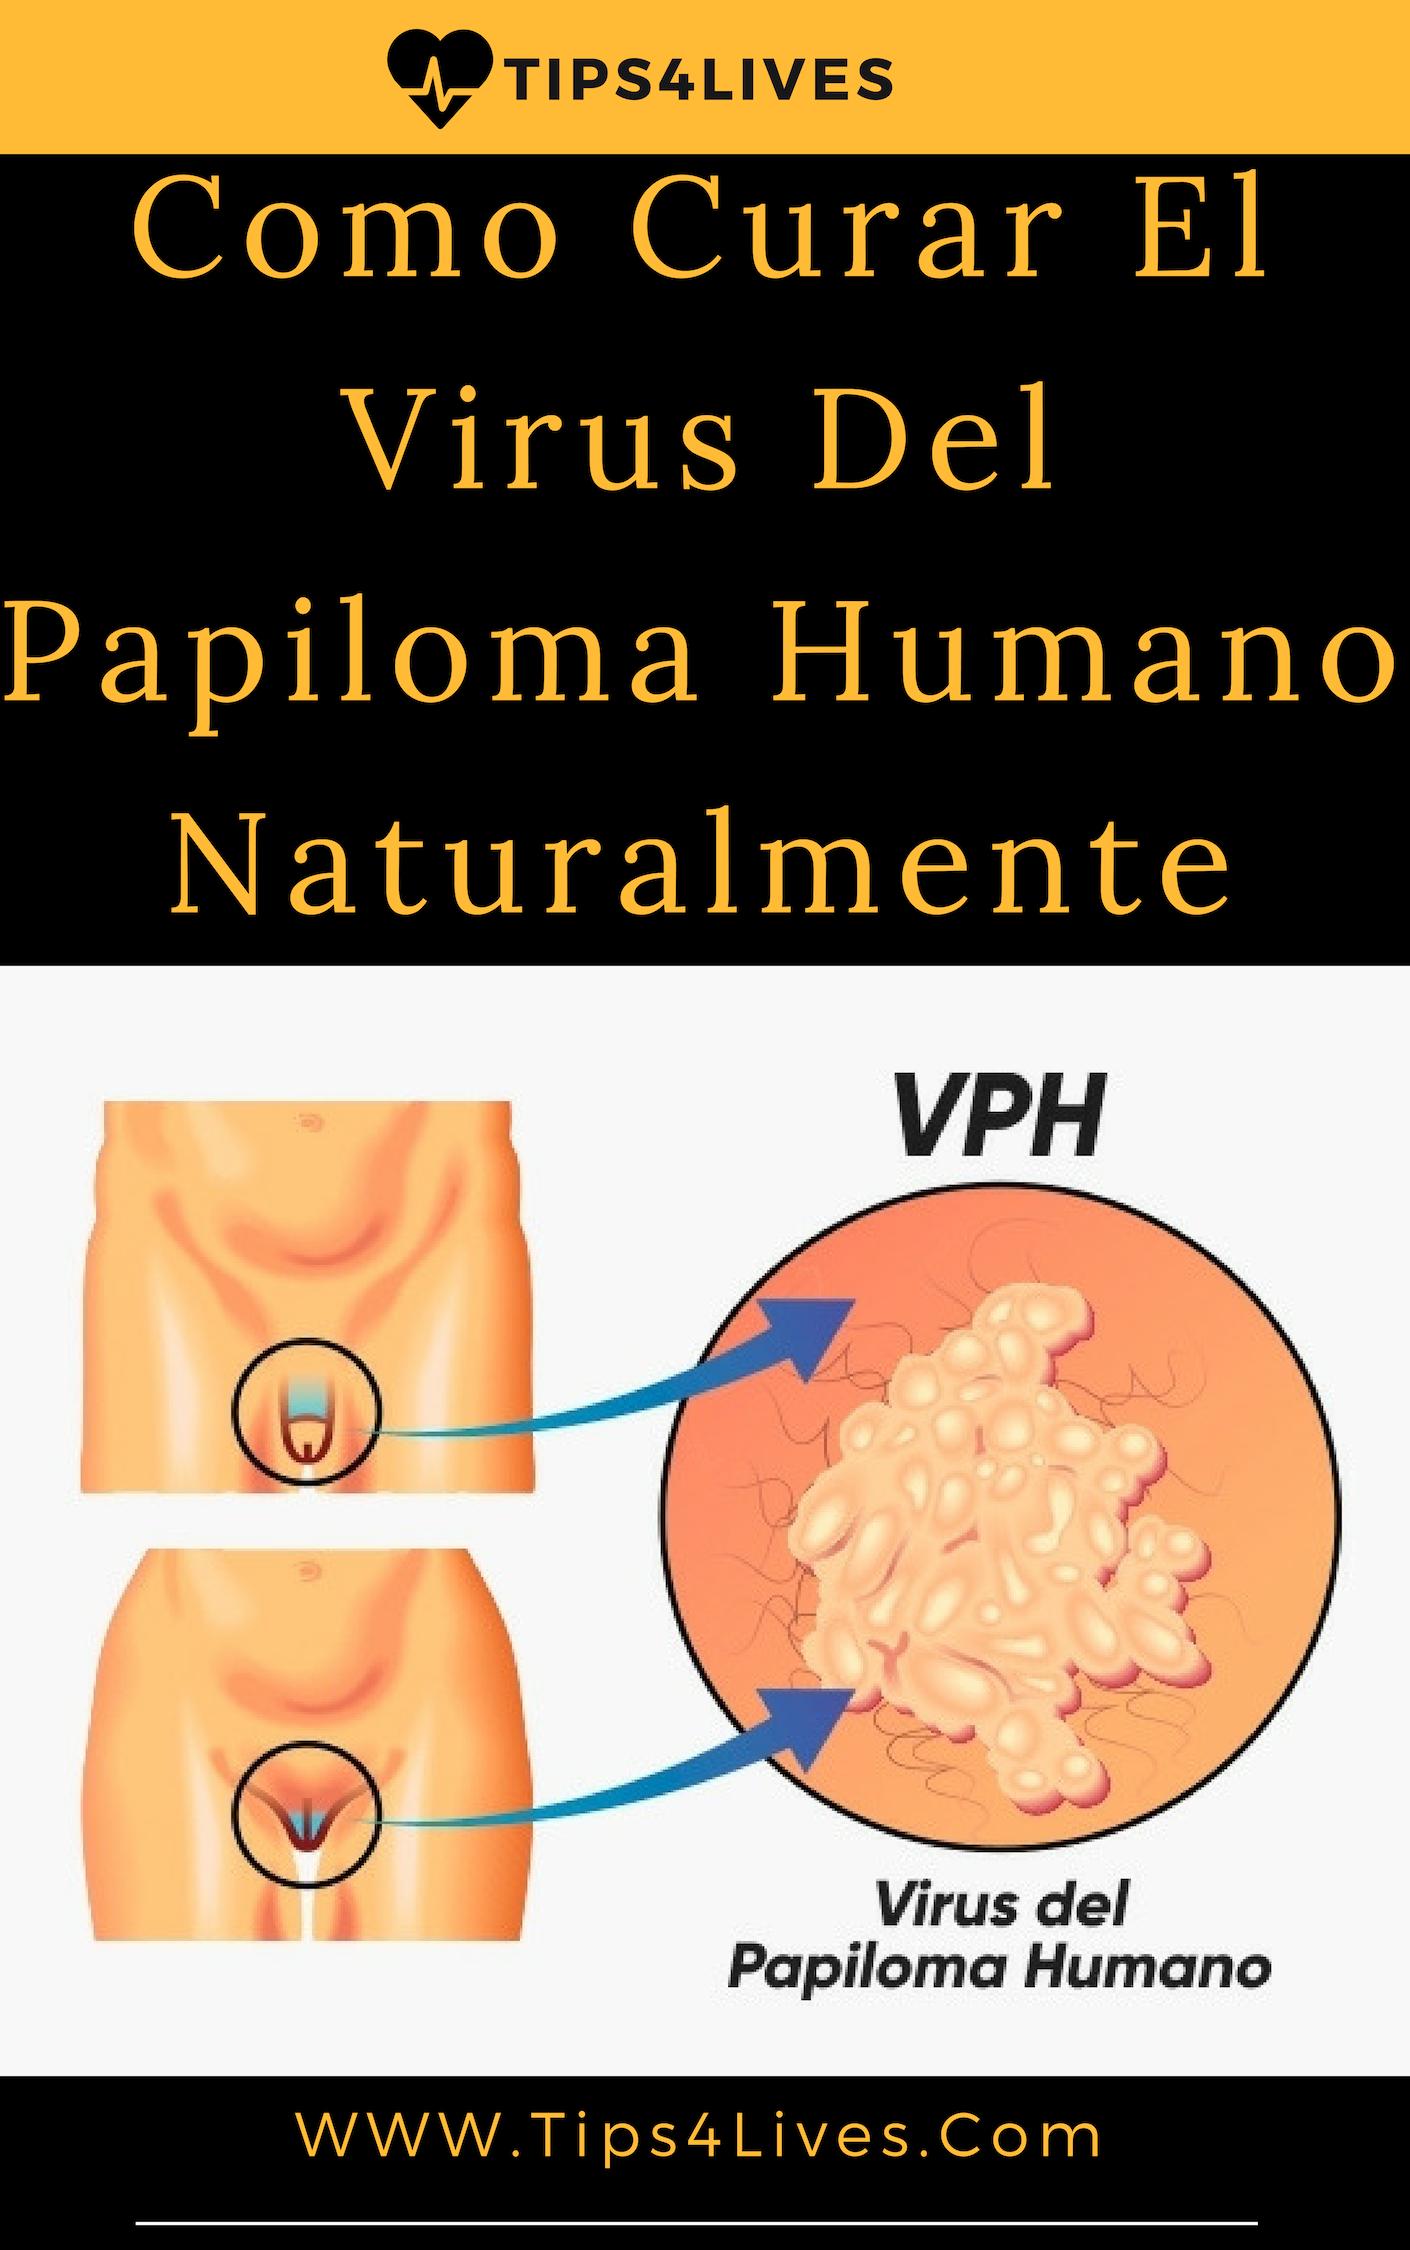 papiloma humano tratamiento mujer papilloma intraduttale intervento